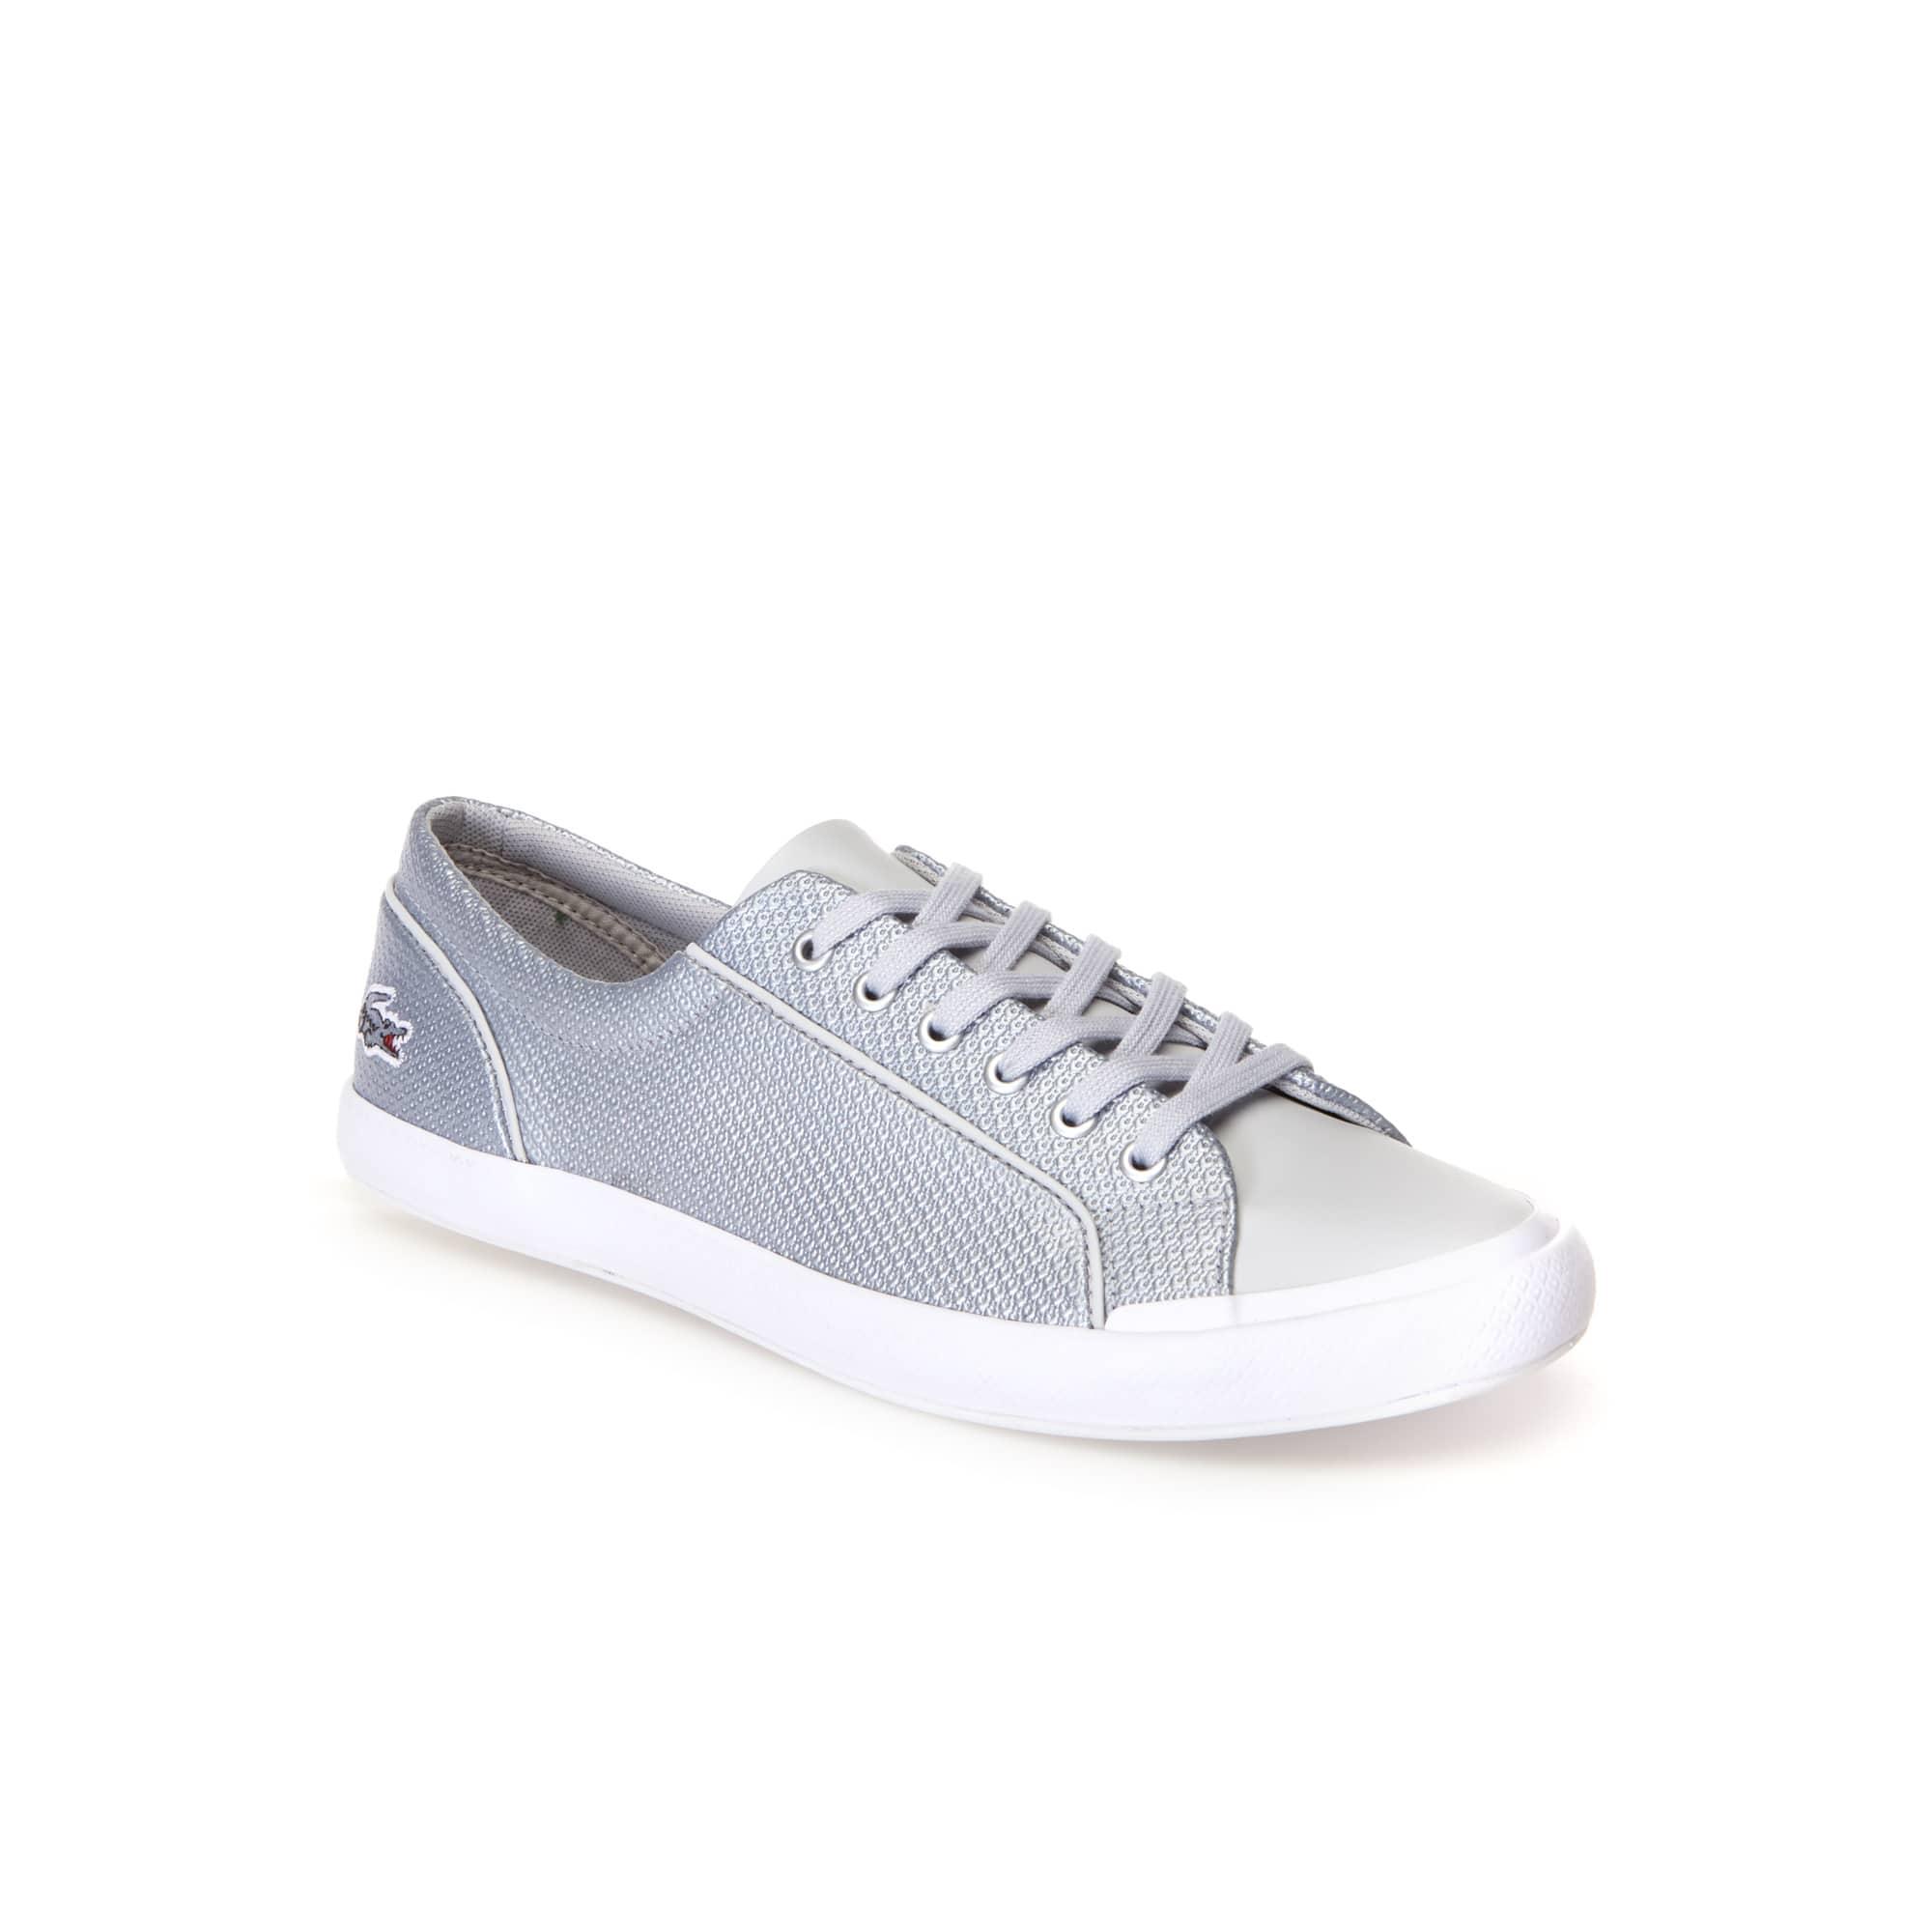 Sneakers Lancelle Silver femme Chantaco en cuir